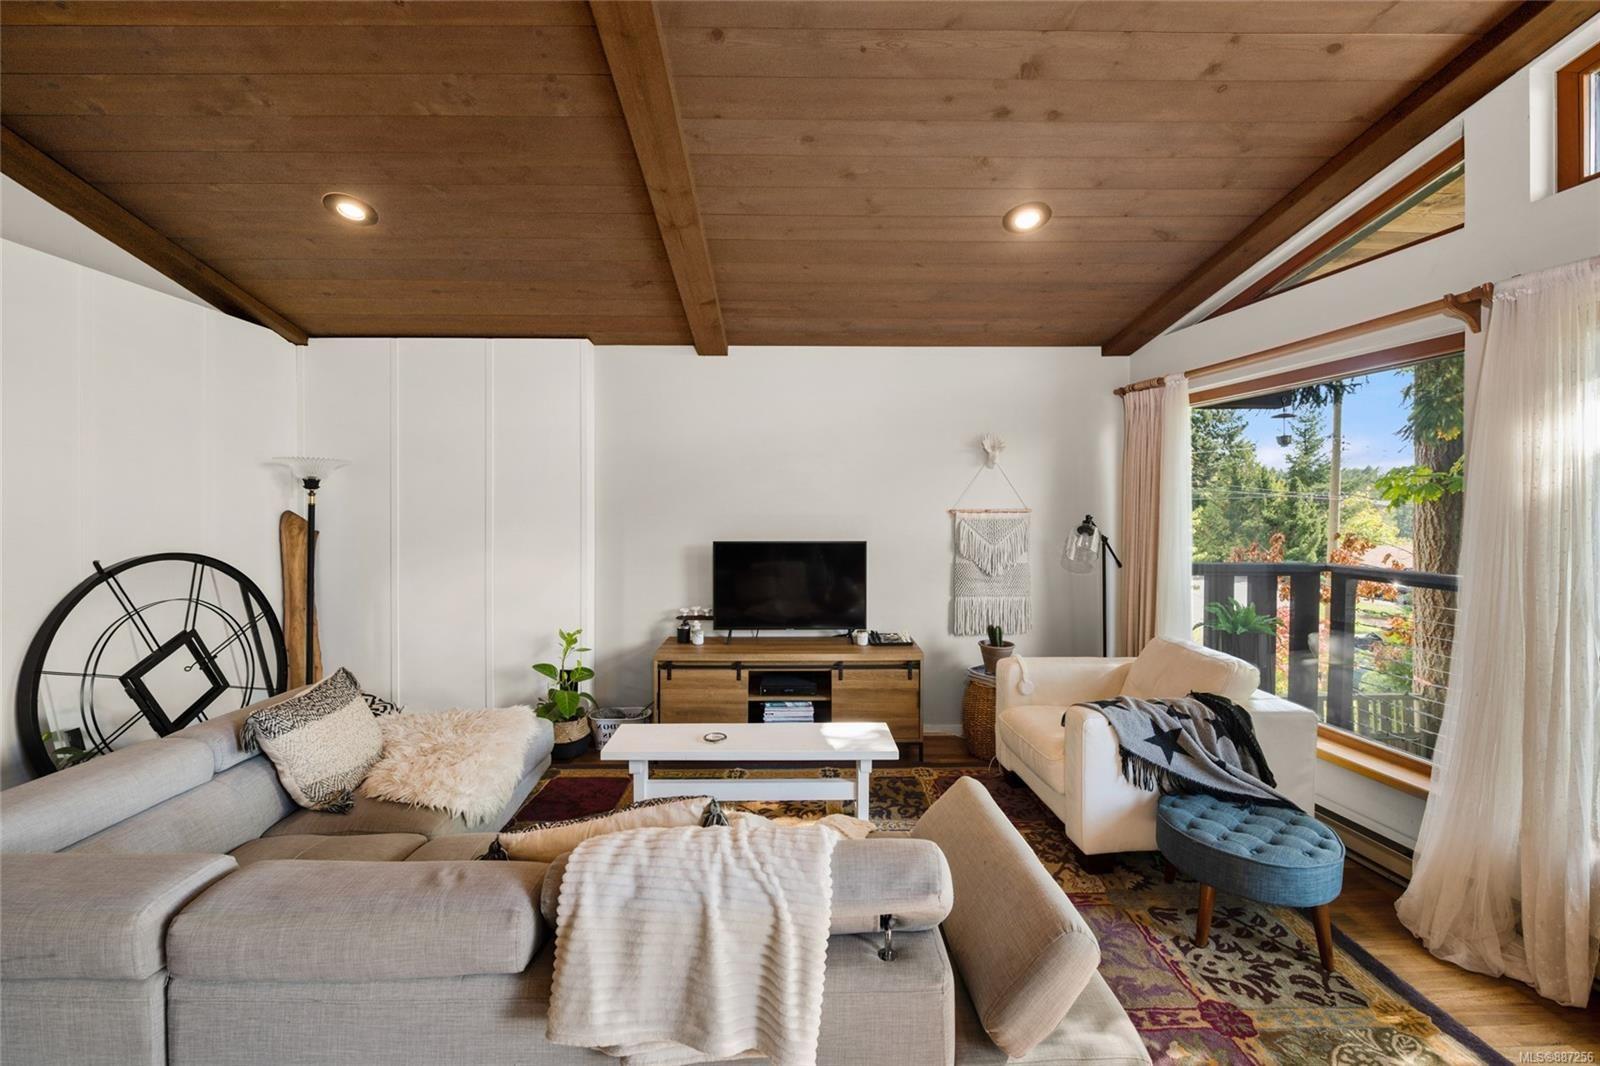 Main Photo: 1819 Deborah Dr in : Du East Duncan House for sale (Duncan)  : MLS®# 887256